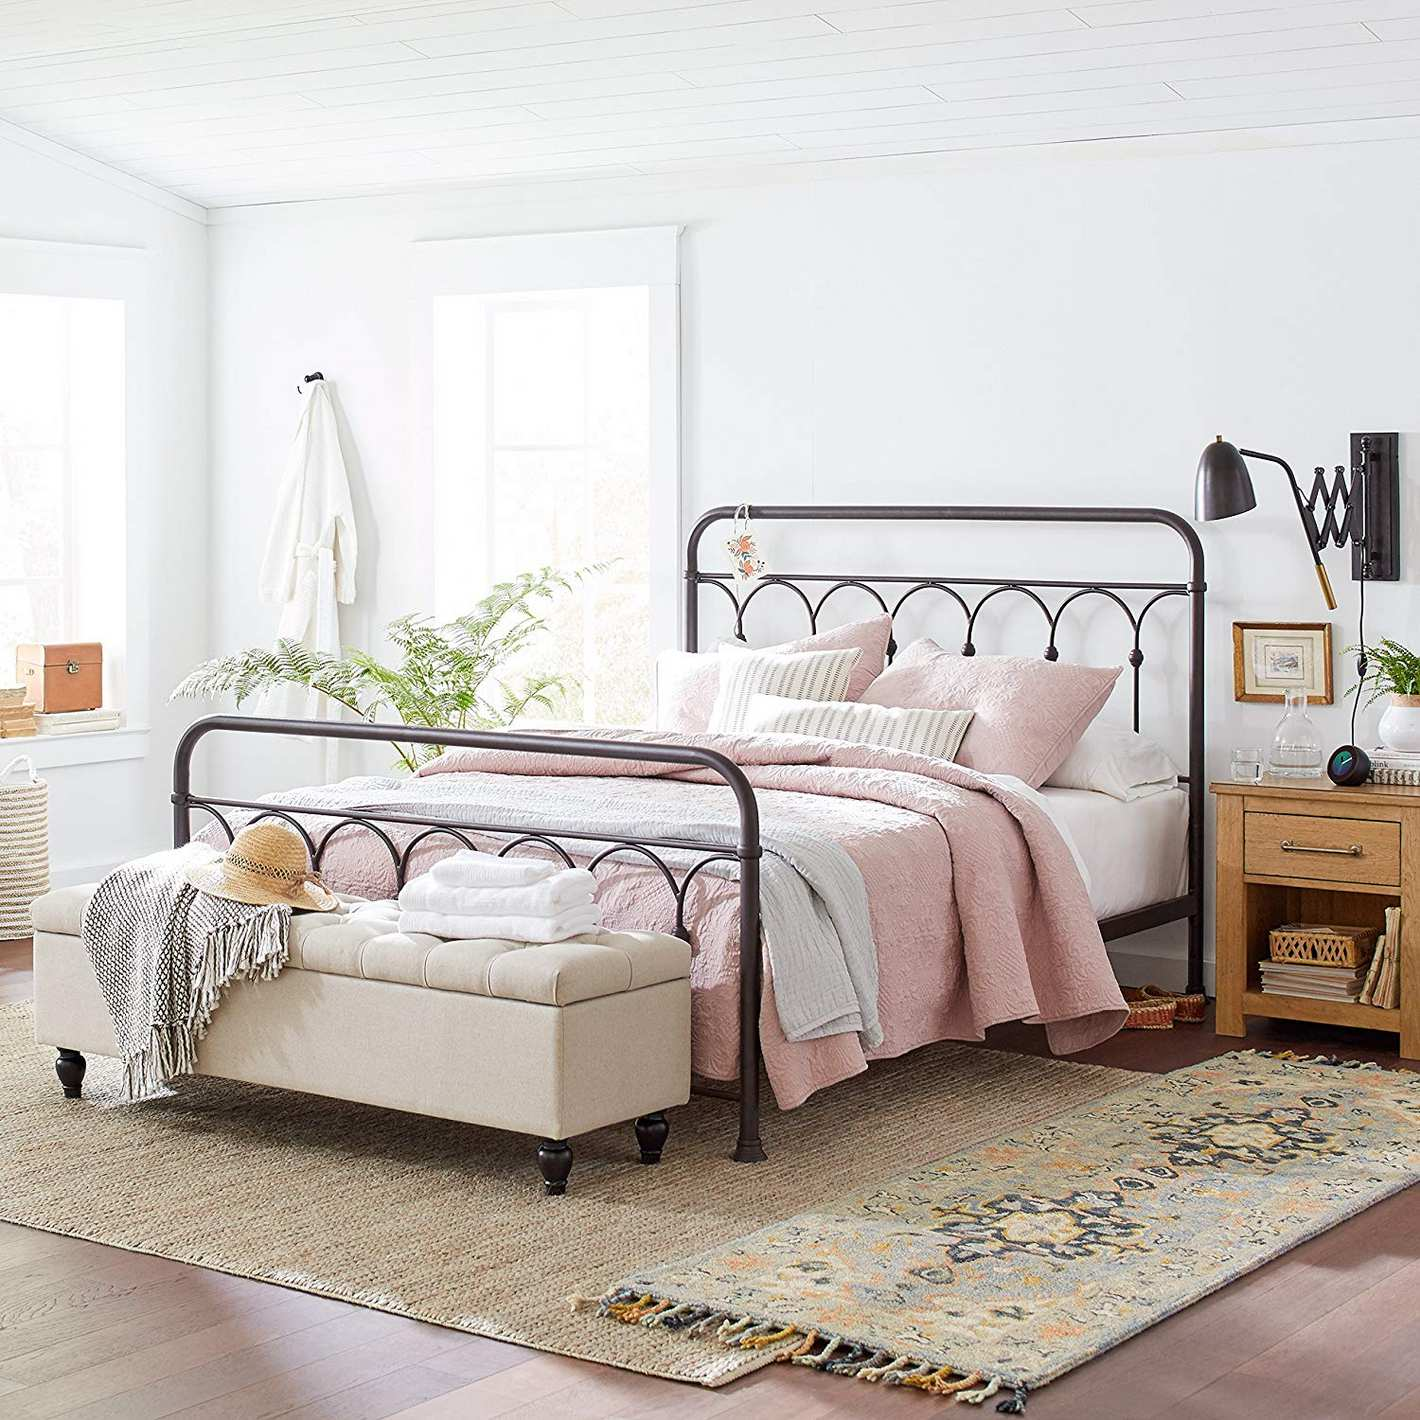 Stone & Beam Vintage Ari Arced Steel Queen Bed Frame